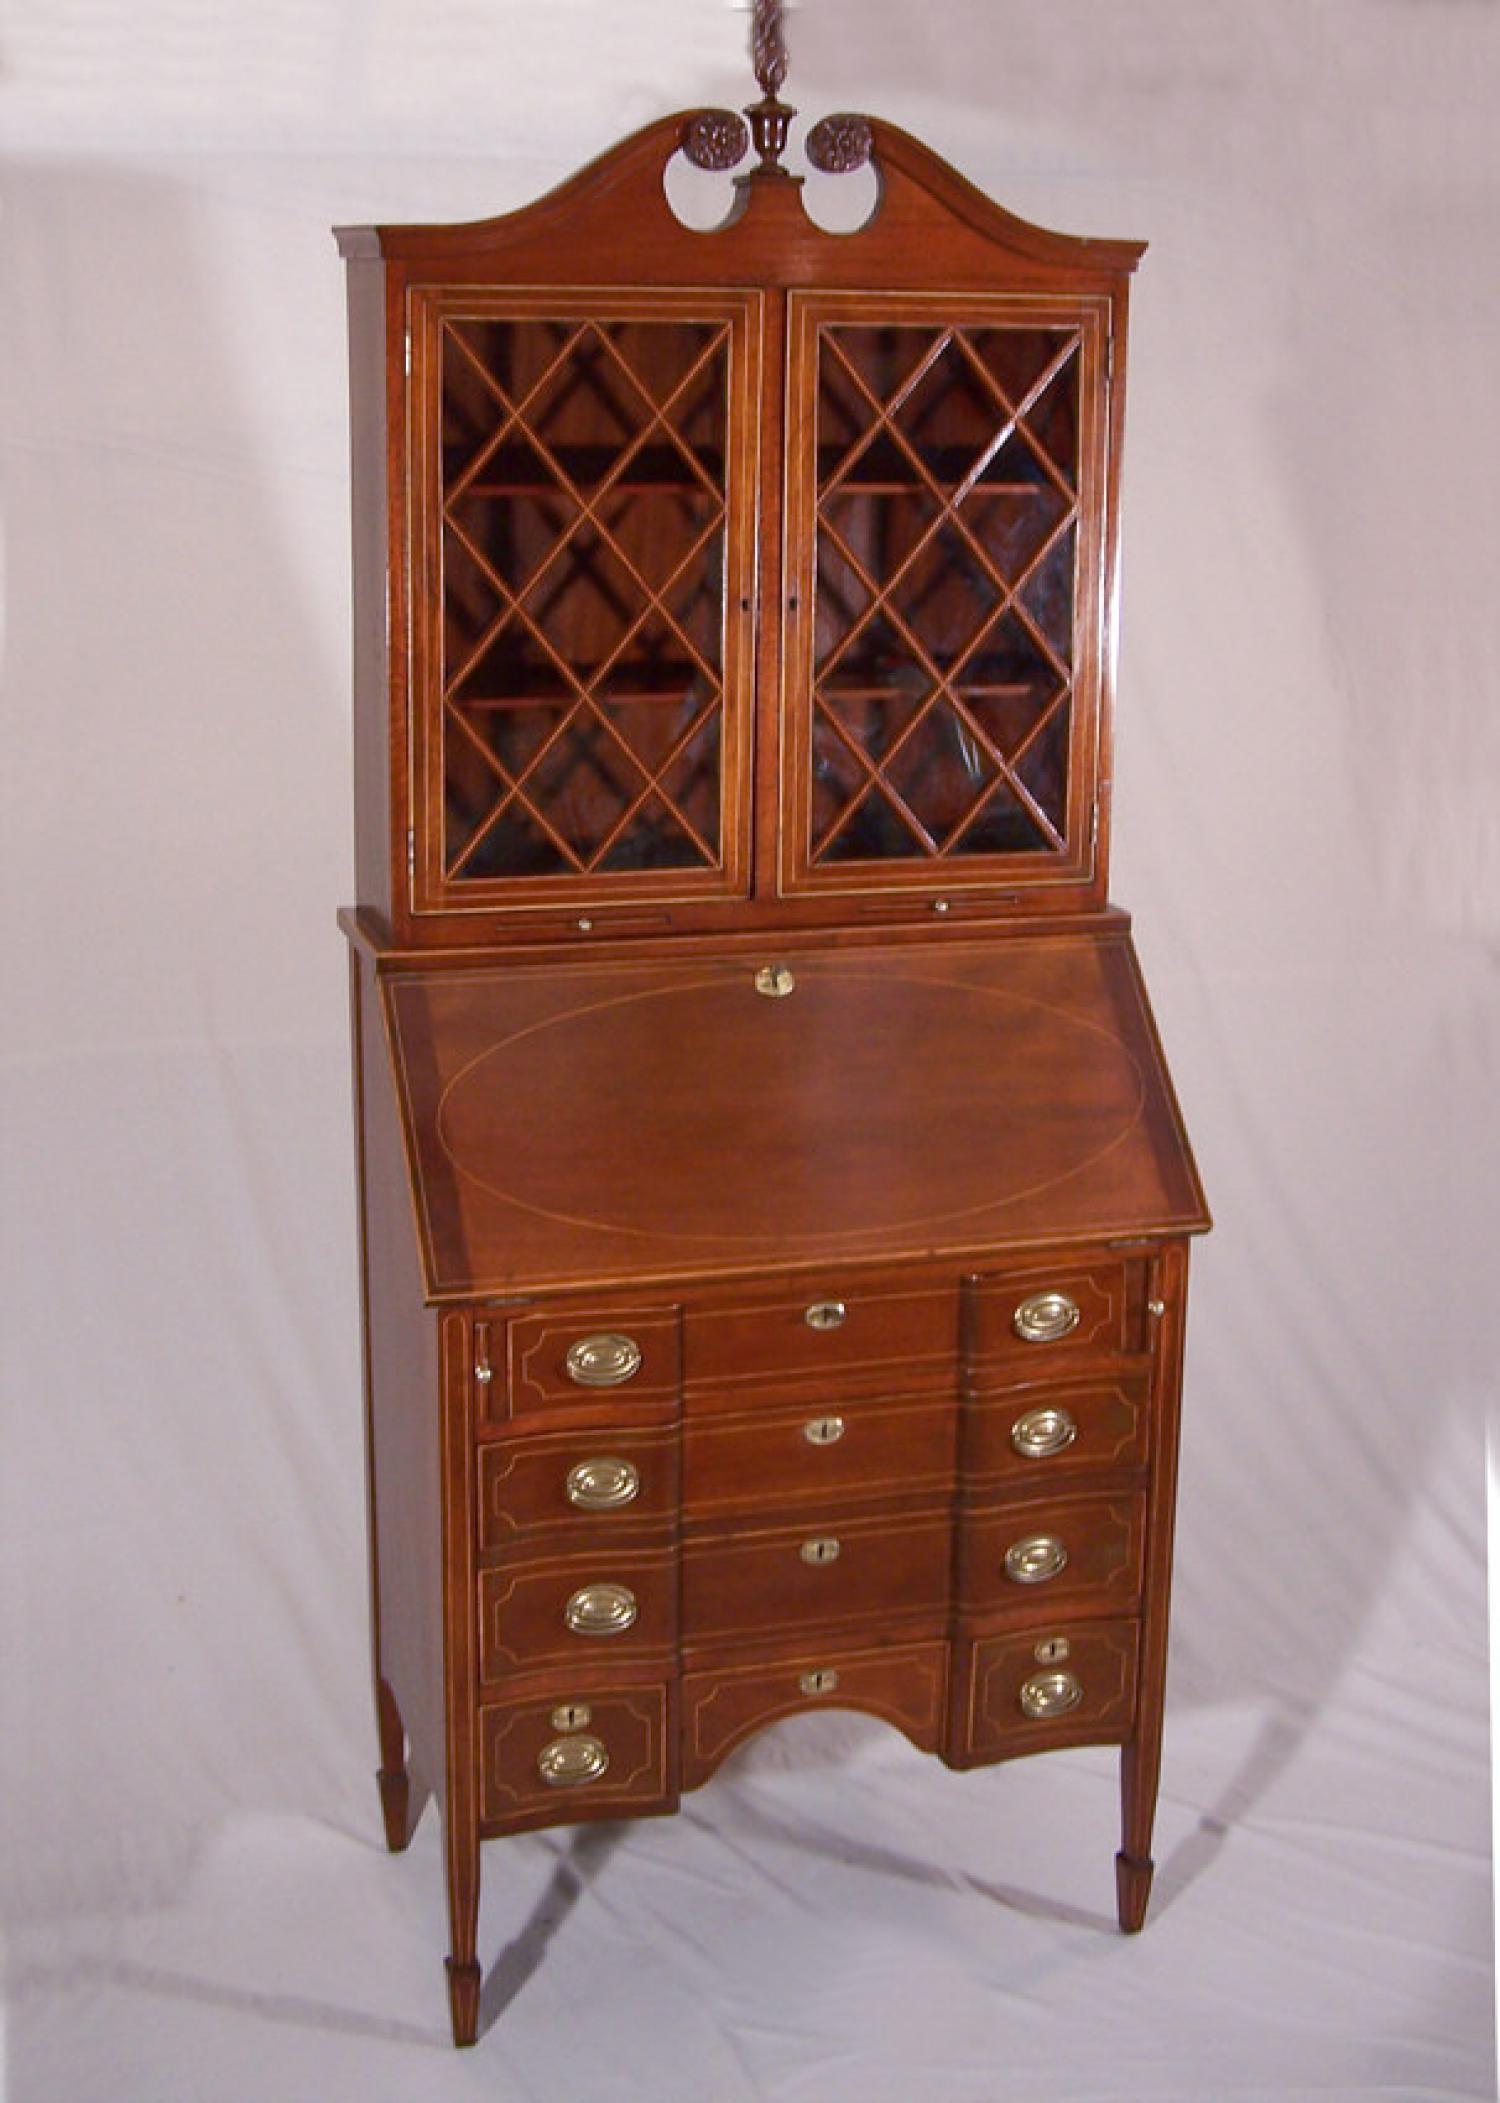 Centennial period Federal style mahogany secretary c1875